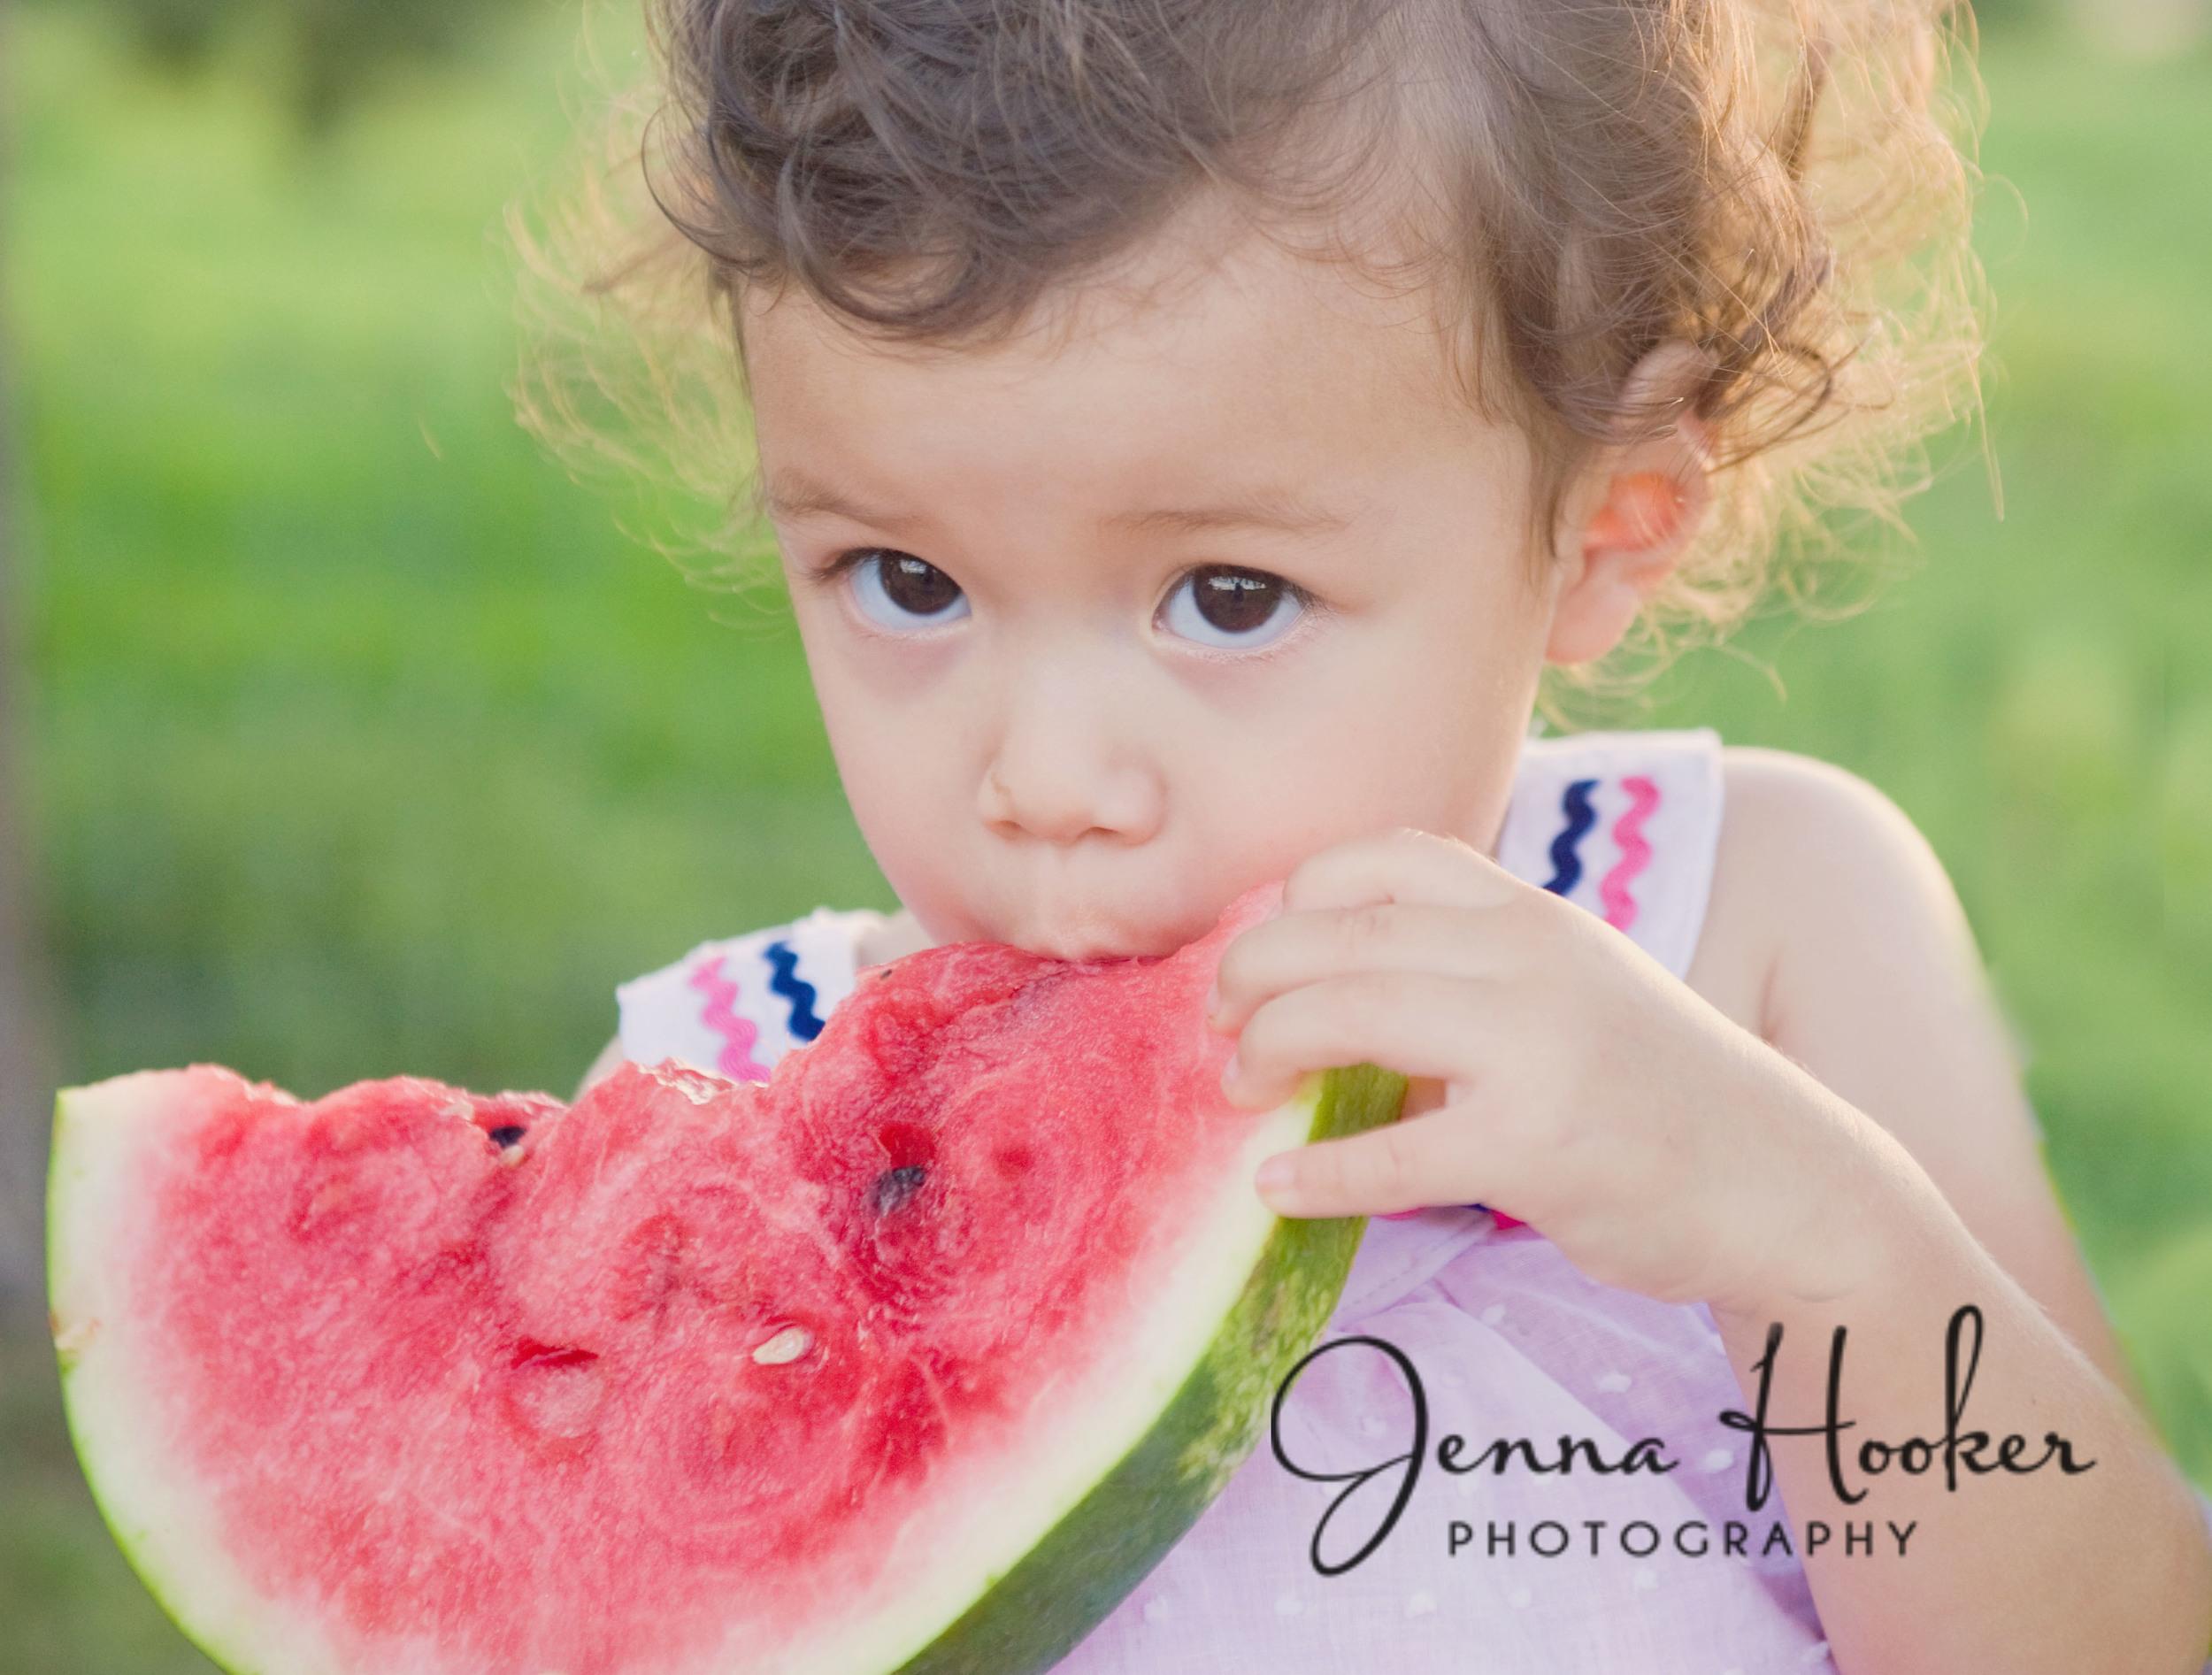 watermelon 4th of july mini photo session